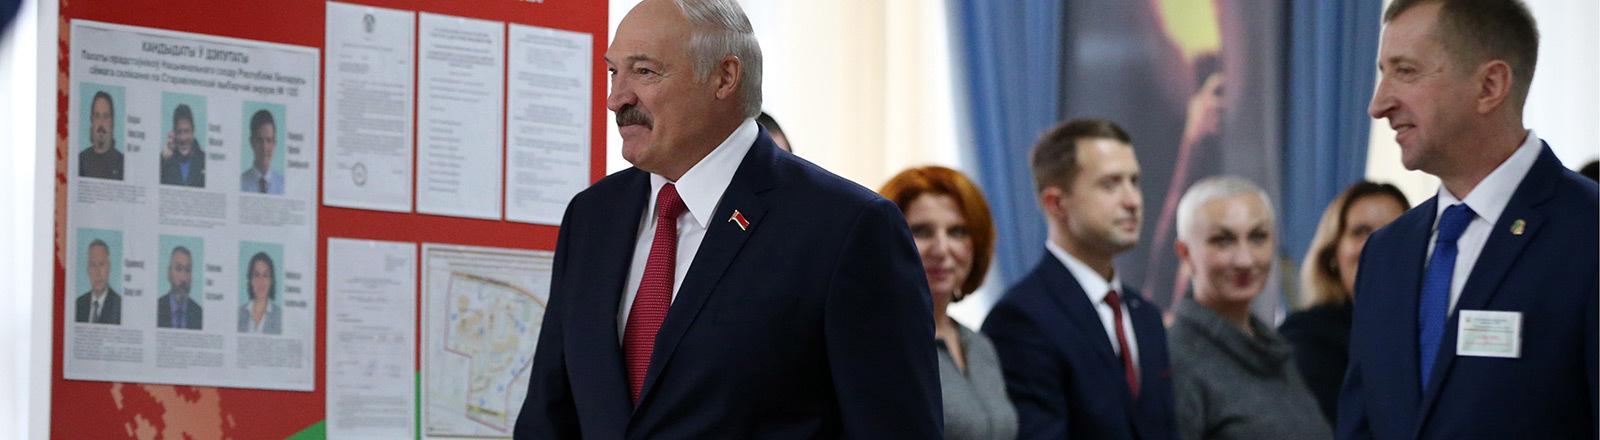 Weißrusslands Präsident Aljaksandr Lukaschenka